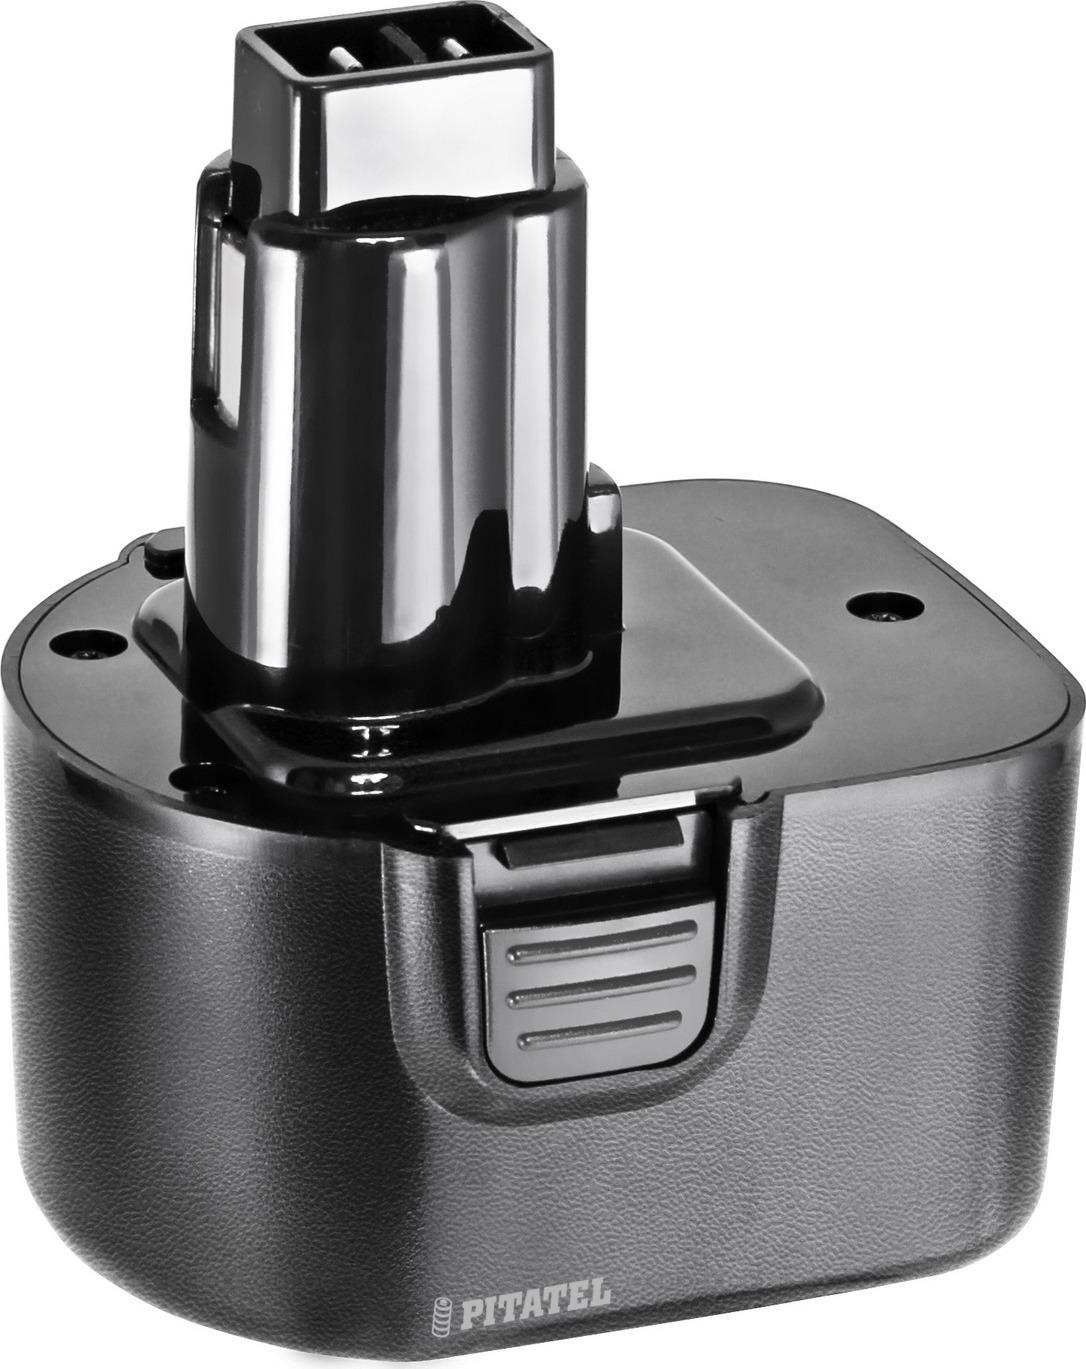 Аккумулятор для инструмента Pitatel для DEWALT. TSB-056-DE12/BD12A-33M аккумулятор для инструмента pitatel для dewalt tsb 056 de12 bd12a 13c